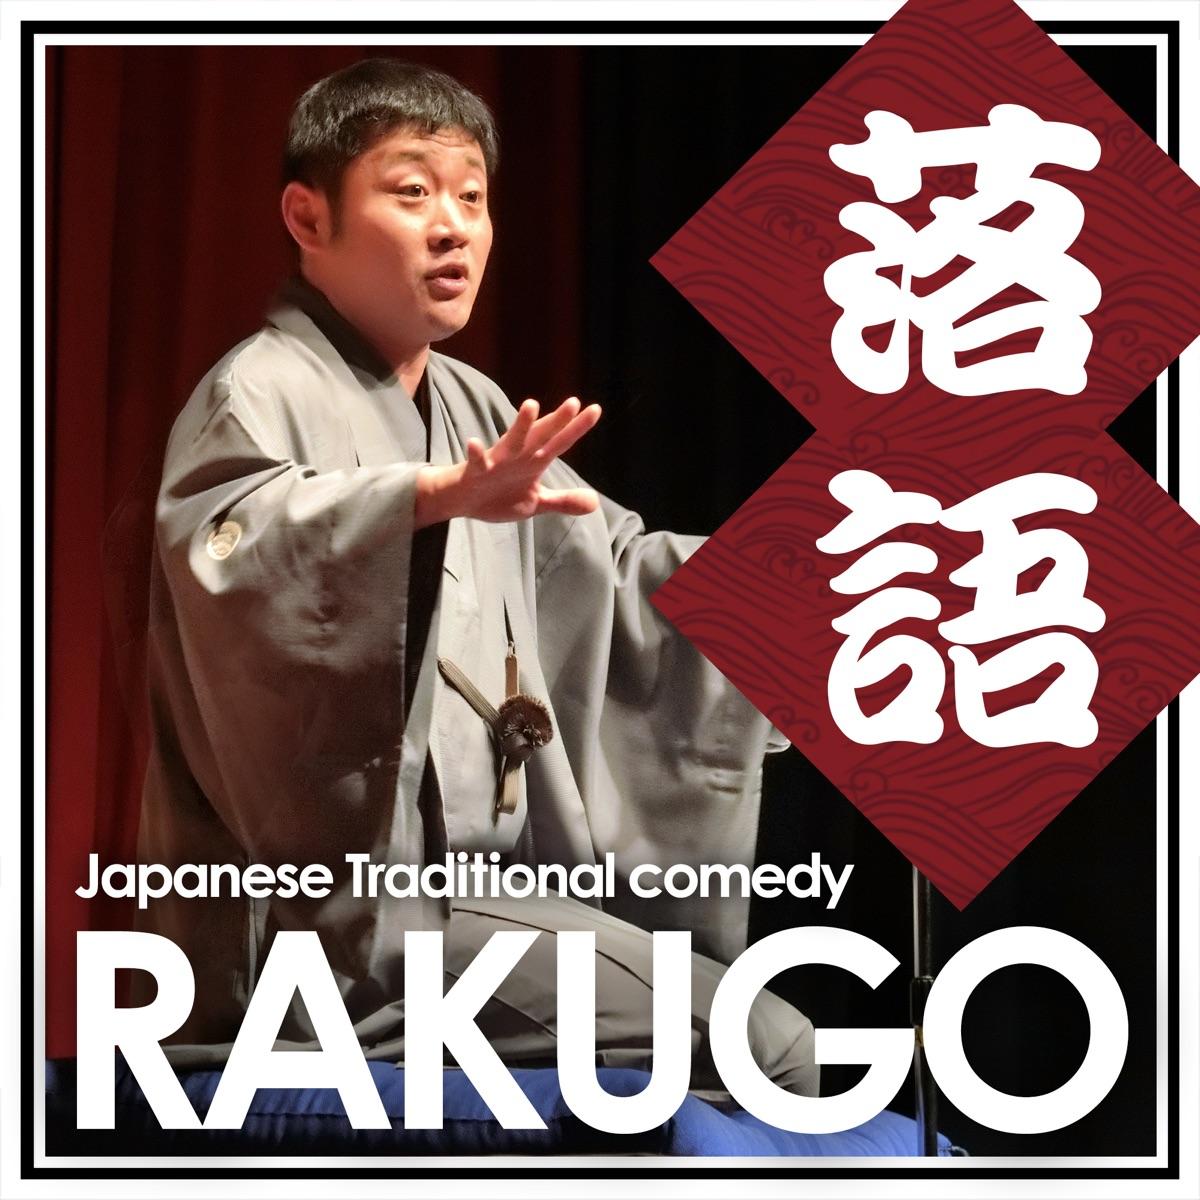 Rakugo - Japanese traditional style comedy -